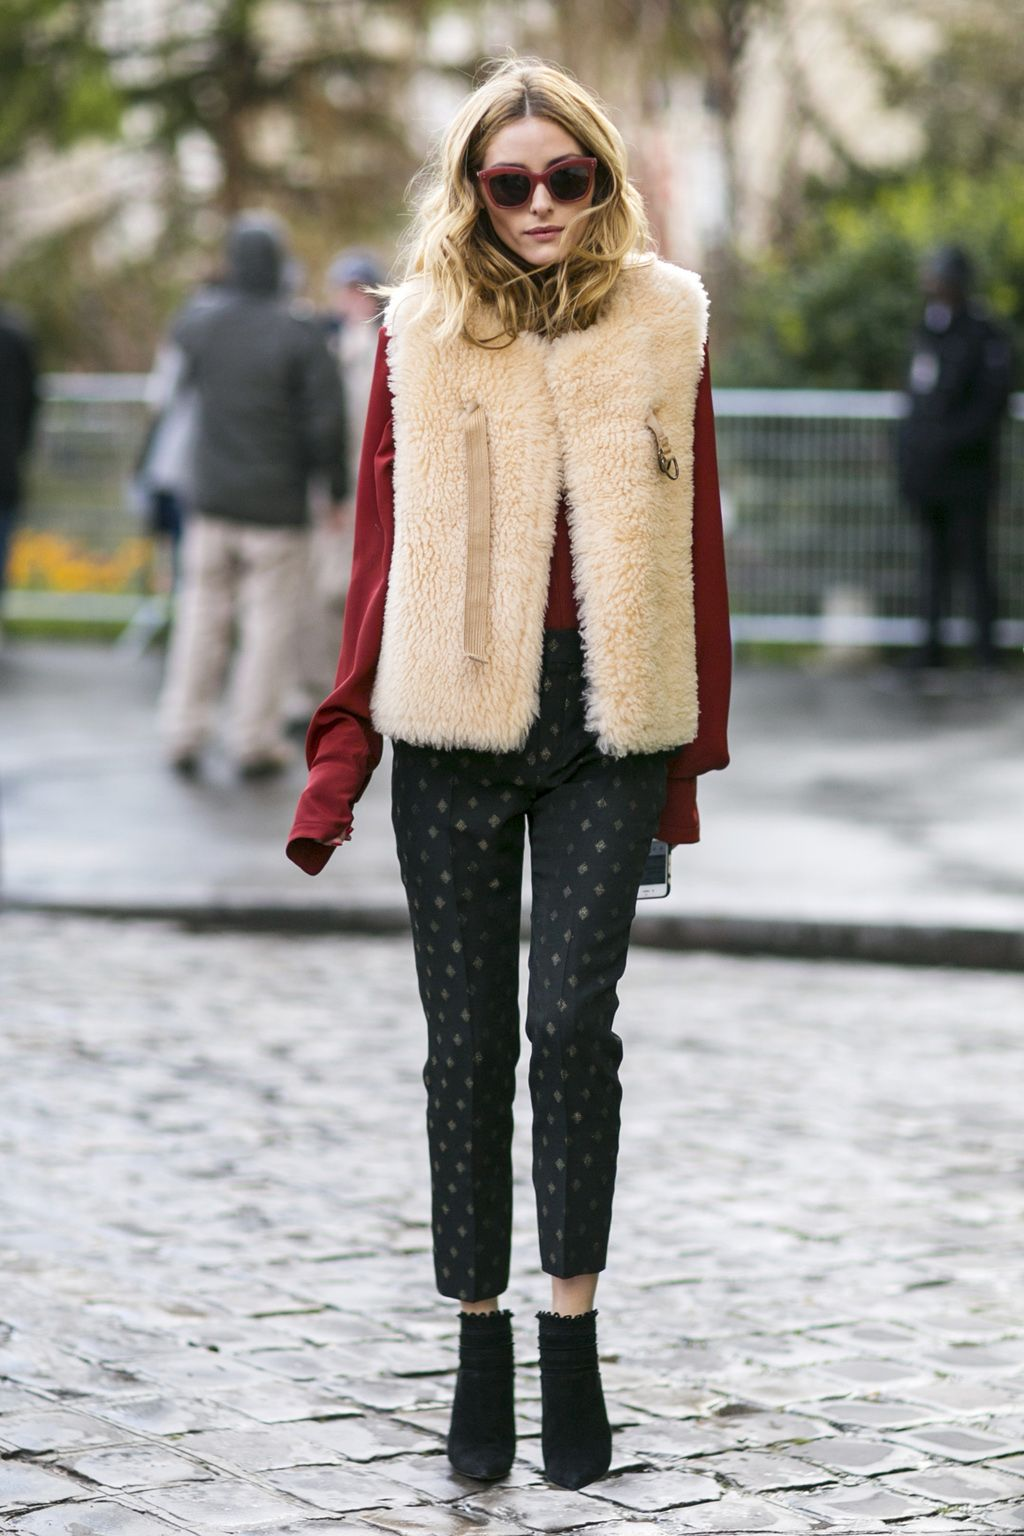 1 prenda, 9 looks: abrigo de pelo. Burgundy long sleeved tee+black printed pants+black ankle boots+ivory fur vest+burgundy sunglasses. Fall Outfit 2016